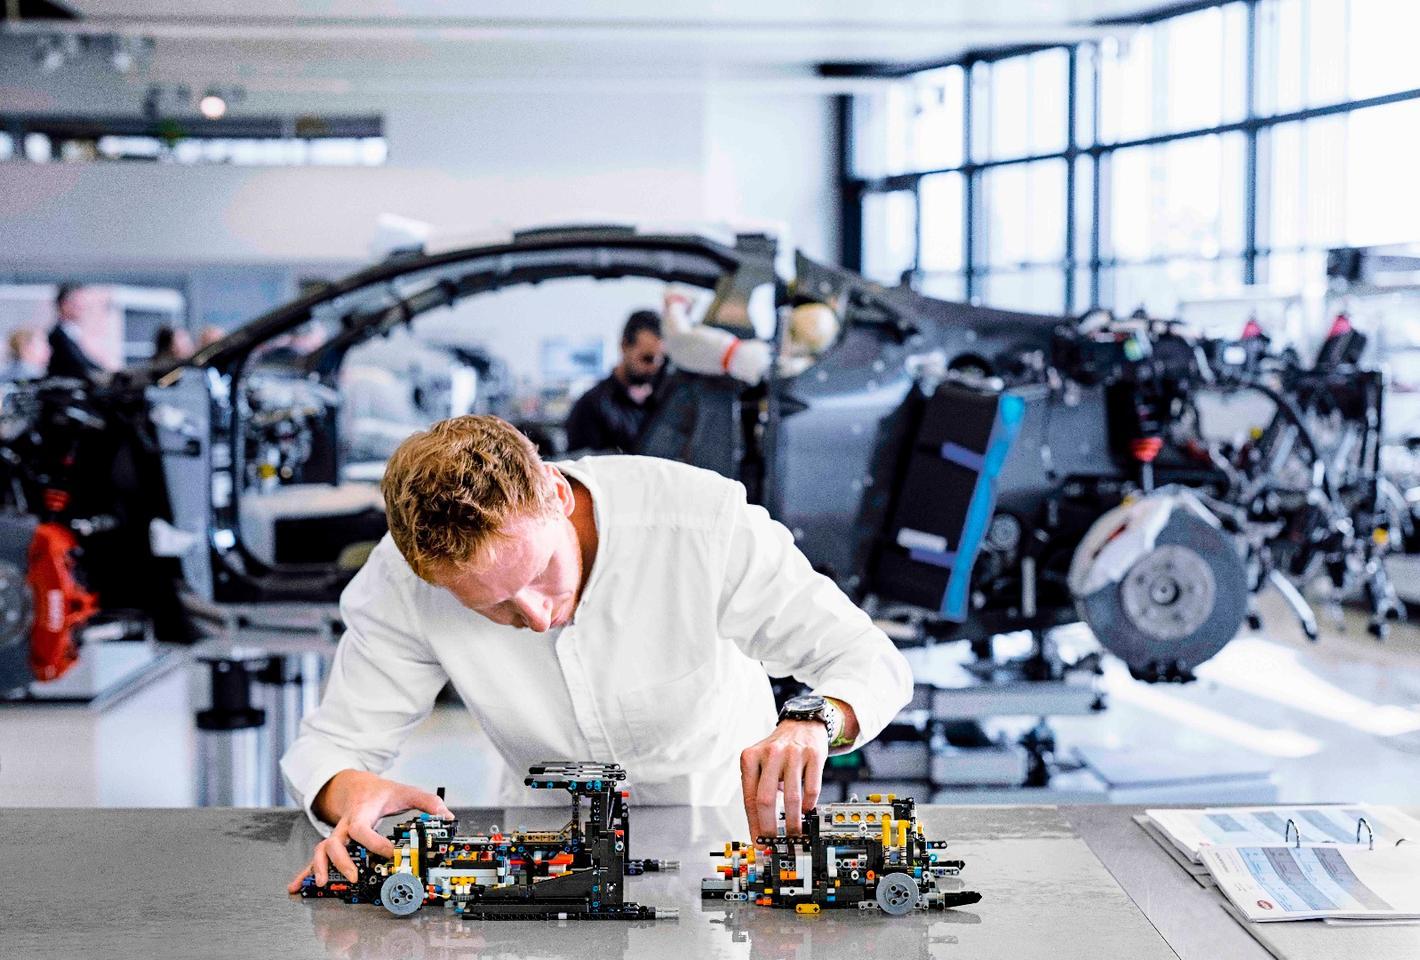 Lego Technic designerAurelien Rouffiange at the Bugatti factory in France